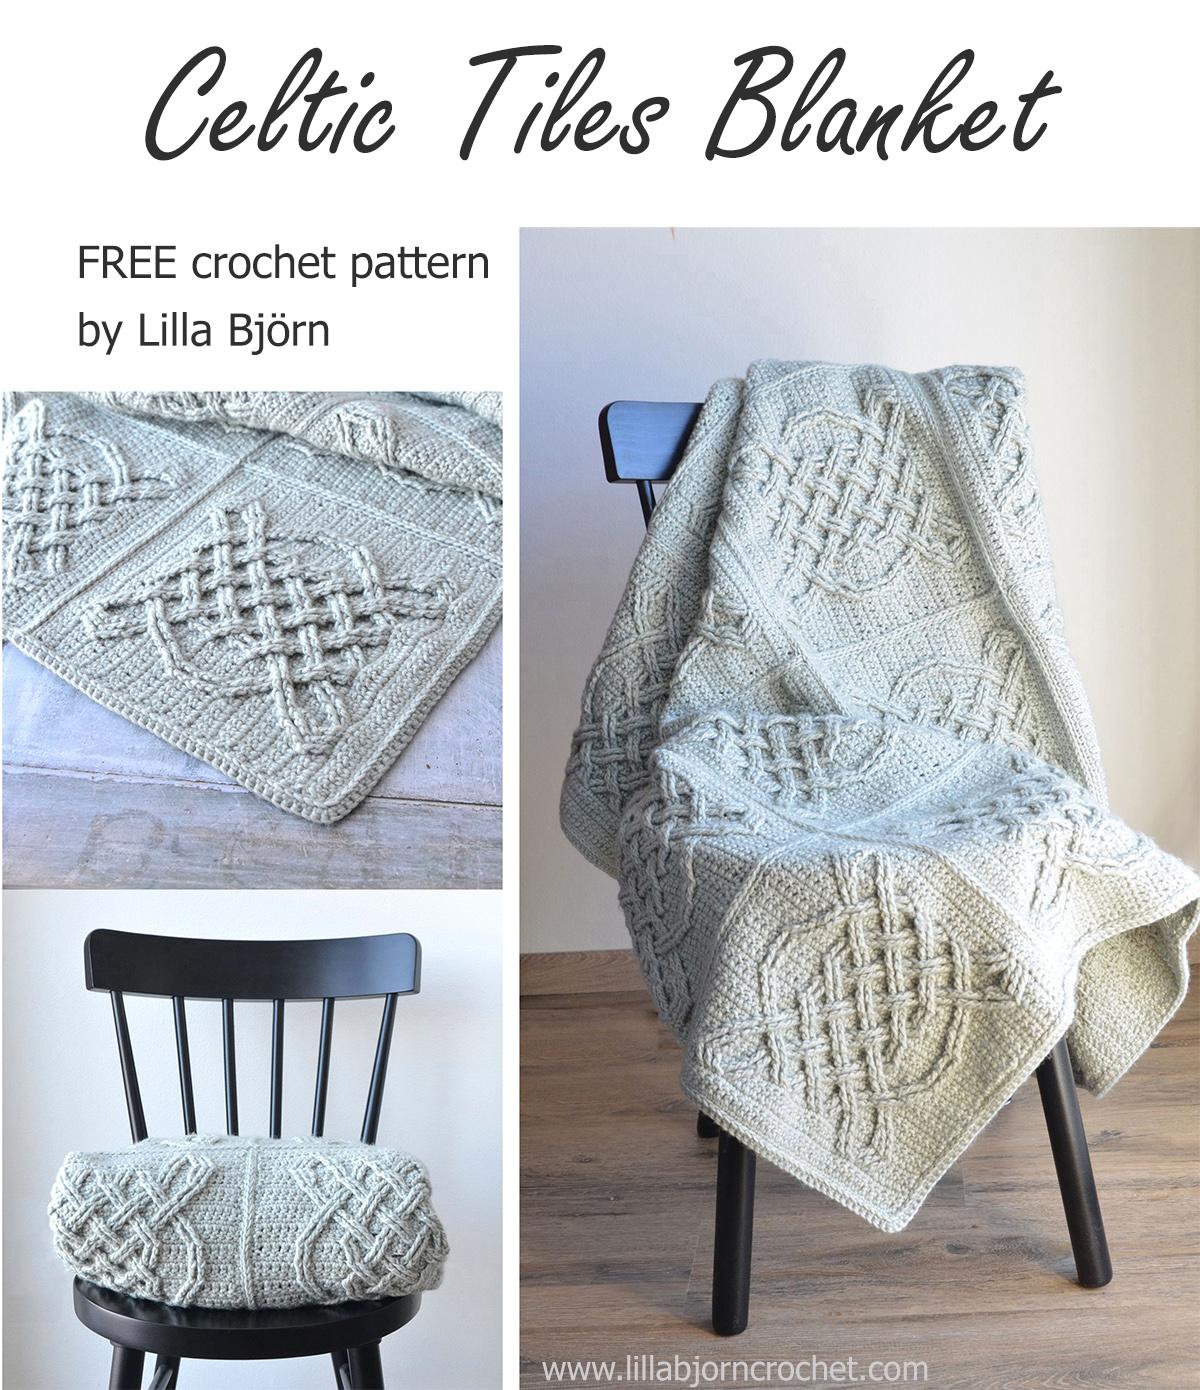 Crochet Patterns Free Cool Design Ideas